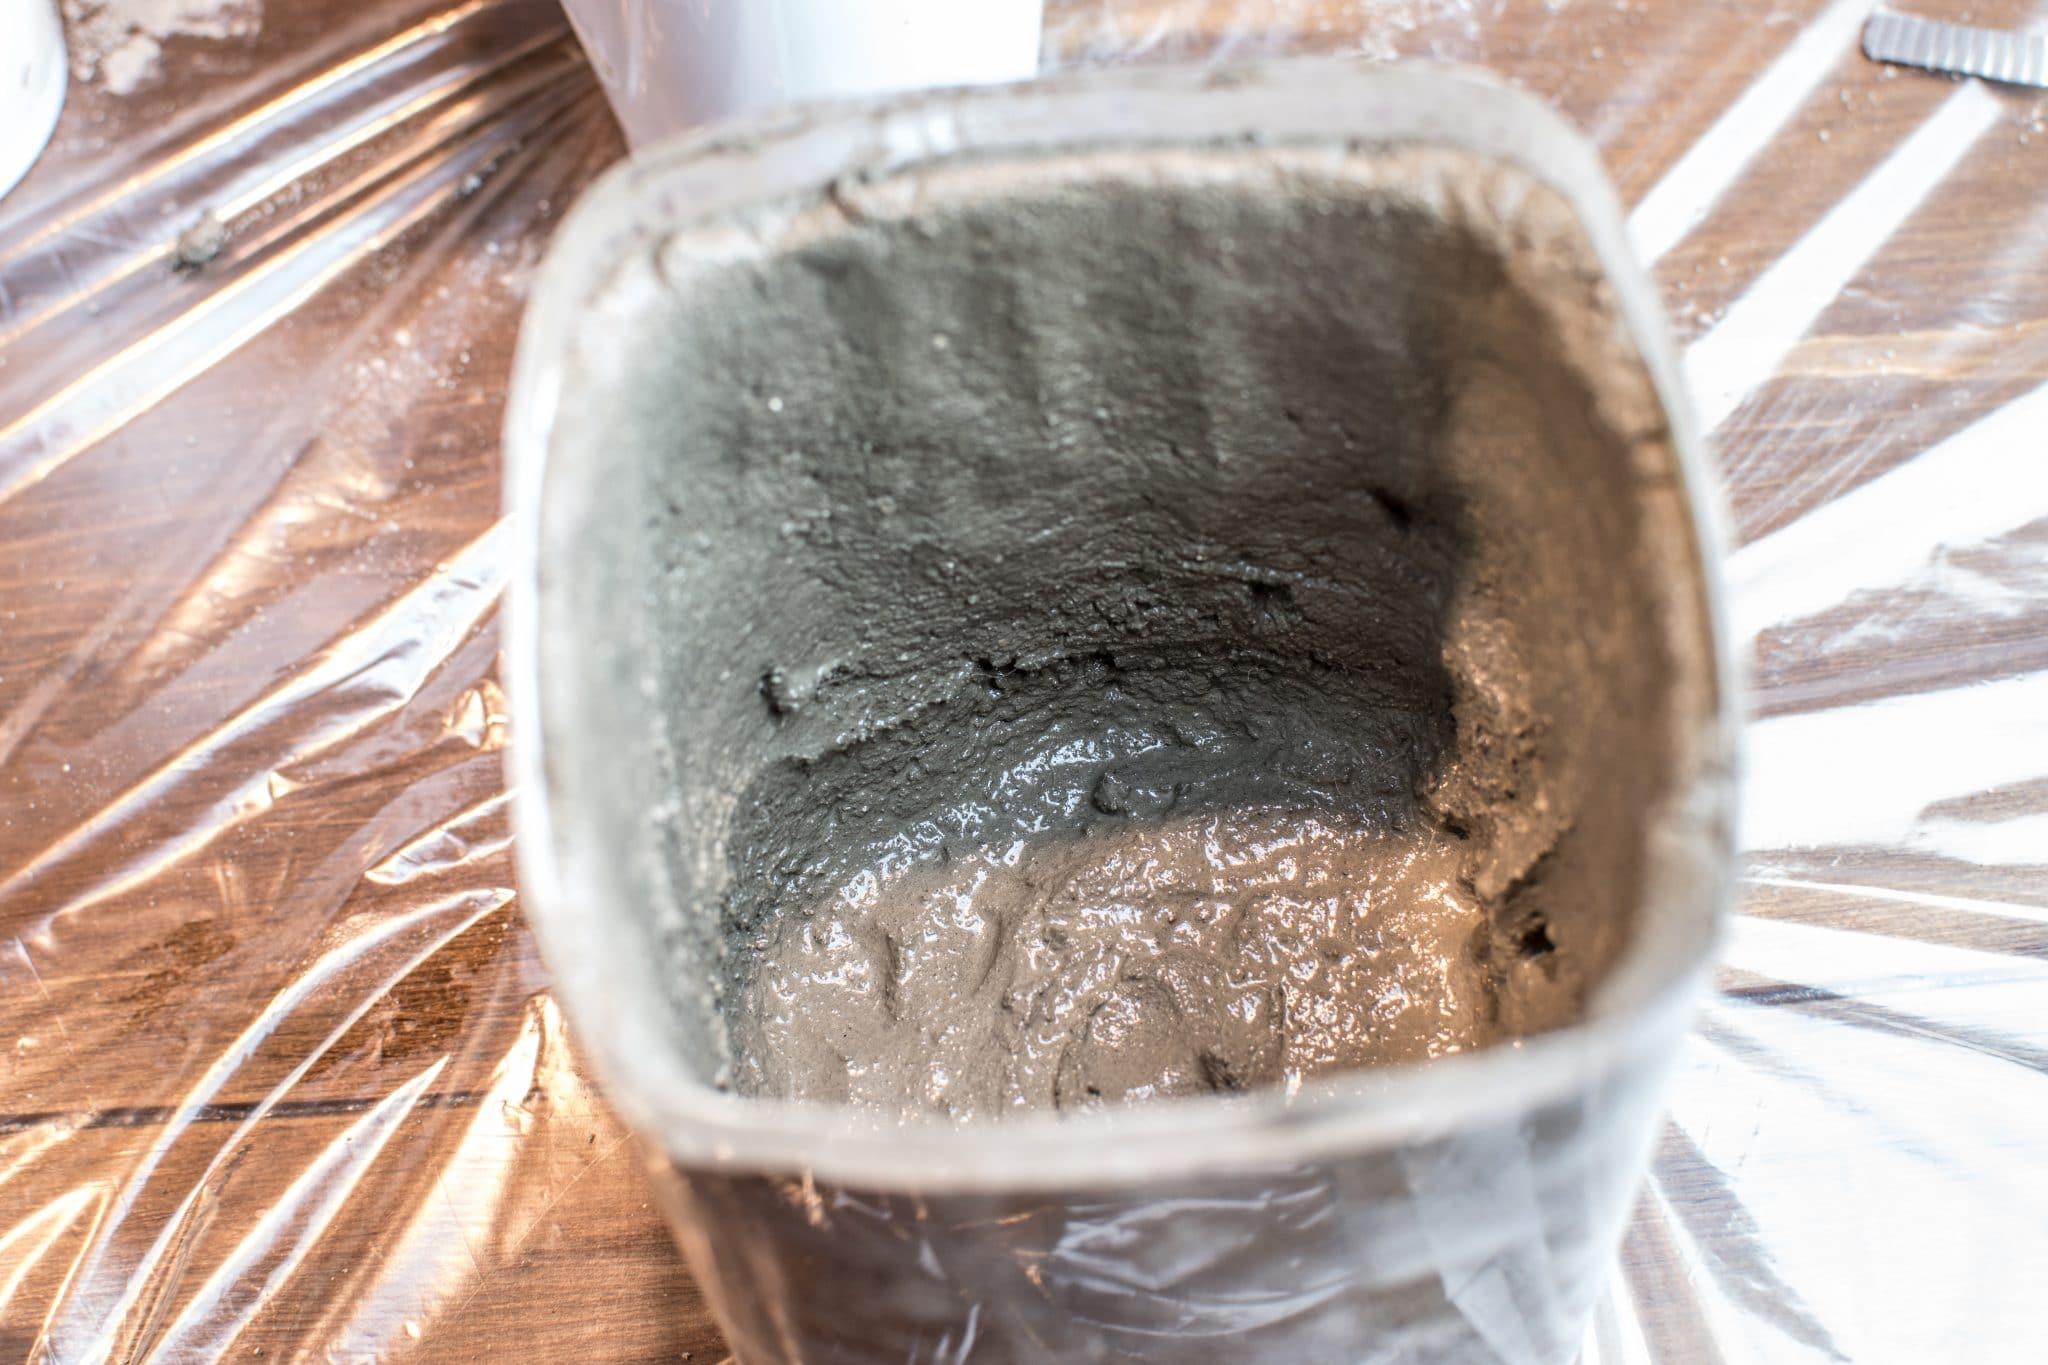 Concrete pots made from moldable Shapecrete